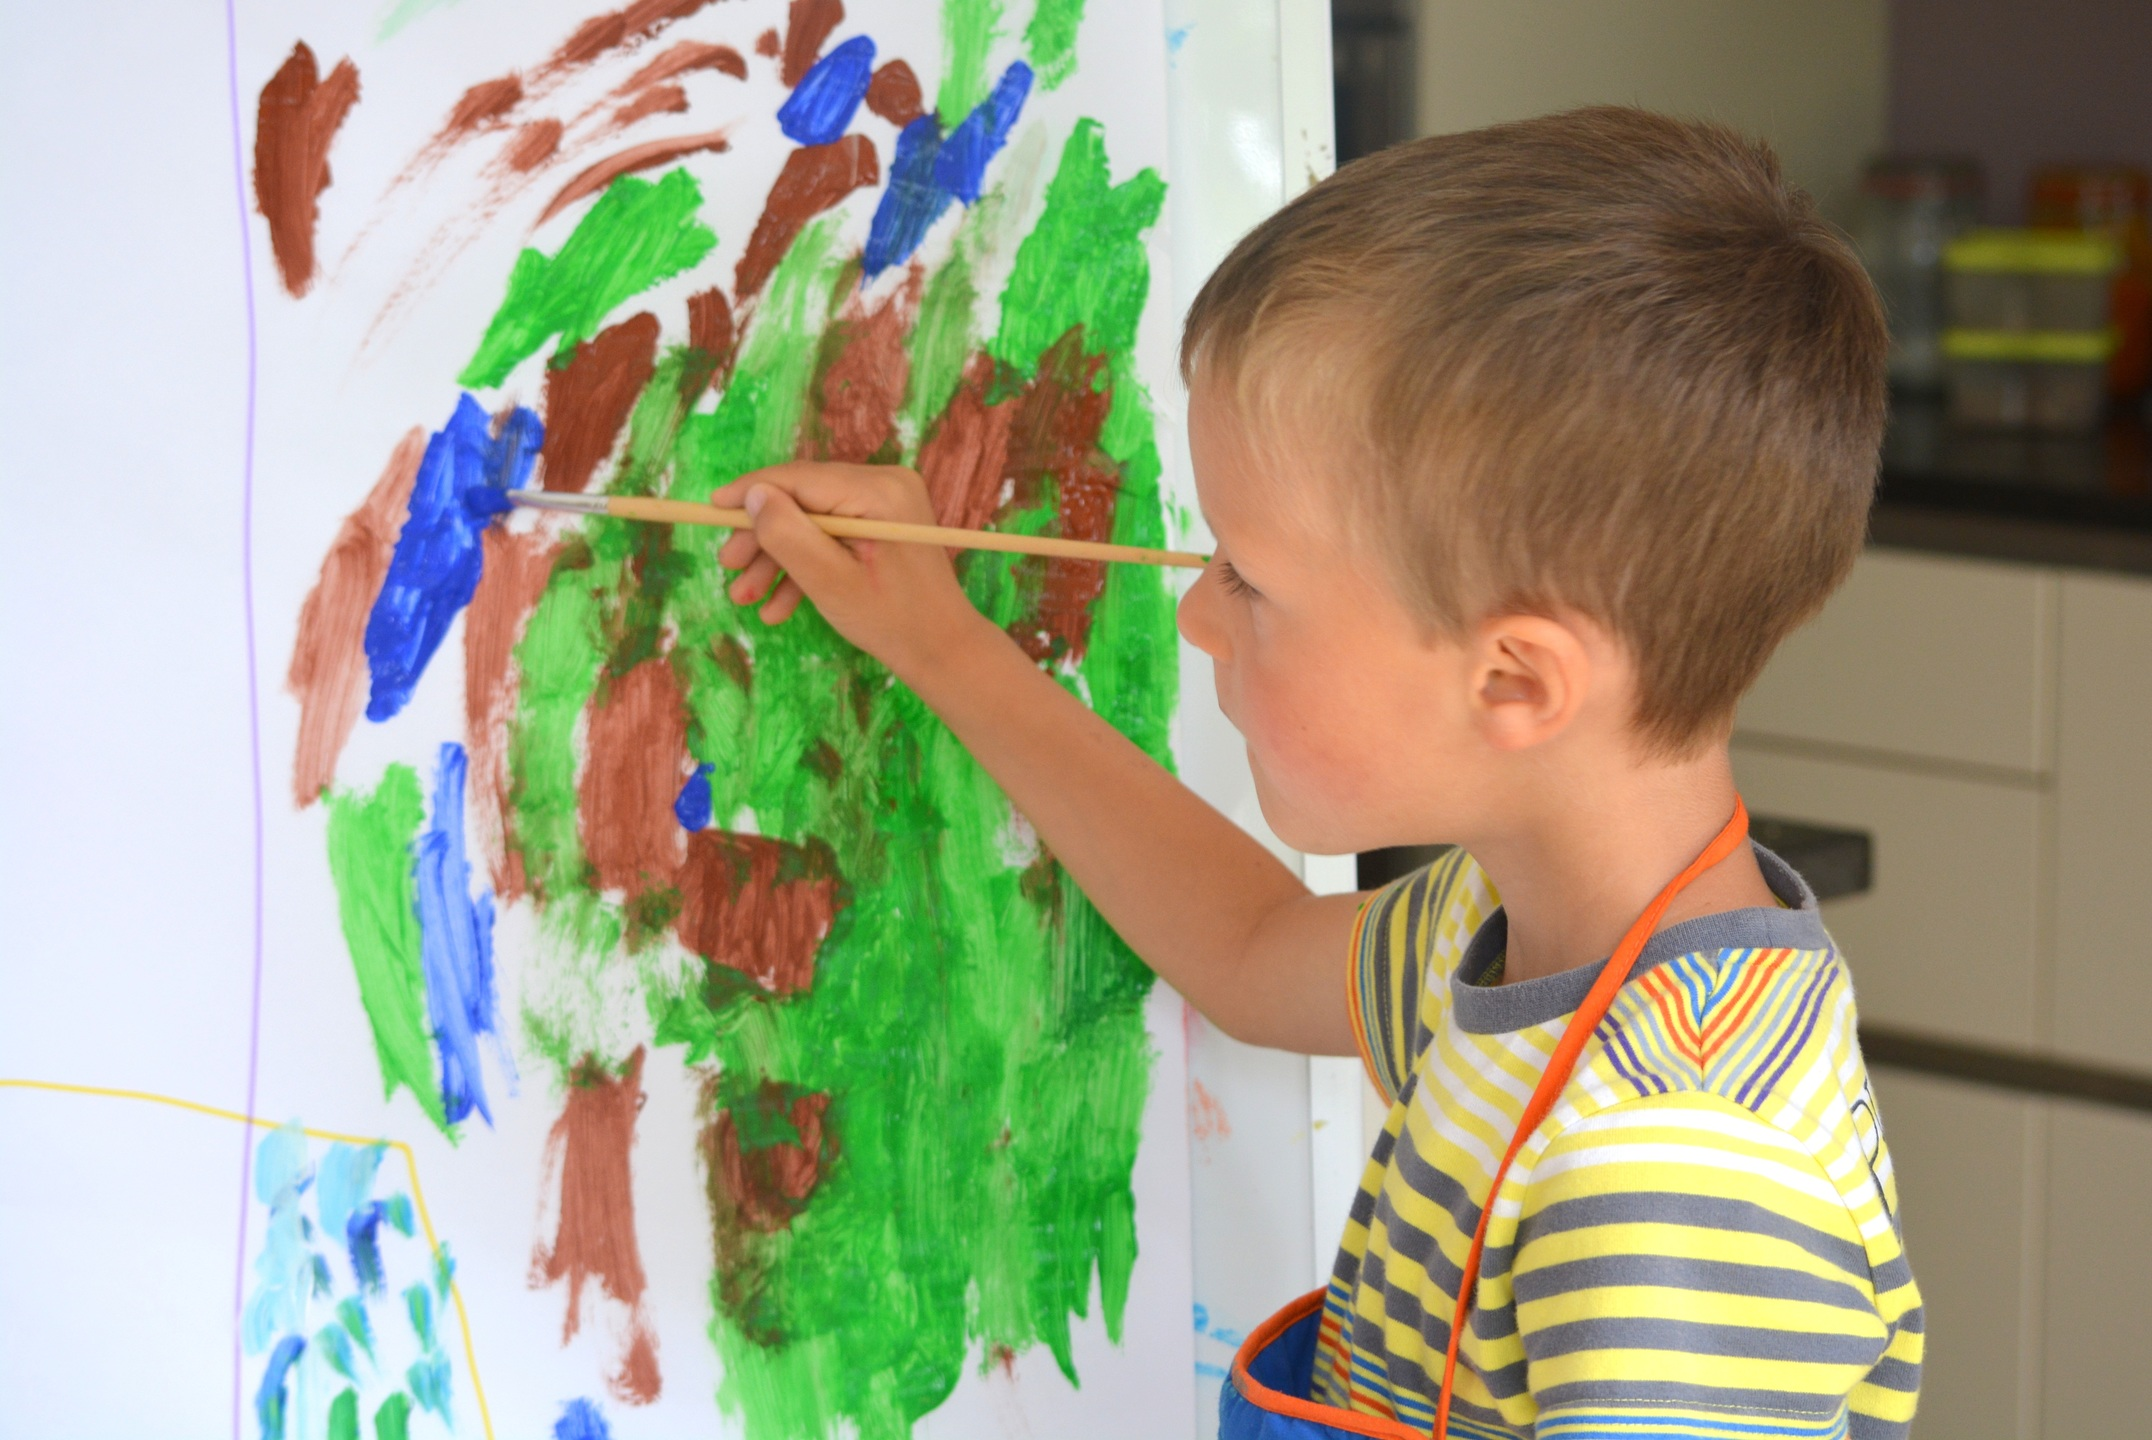 people-play-boy-brush-color-artist-1099898-pxhere.com (2).jpg